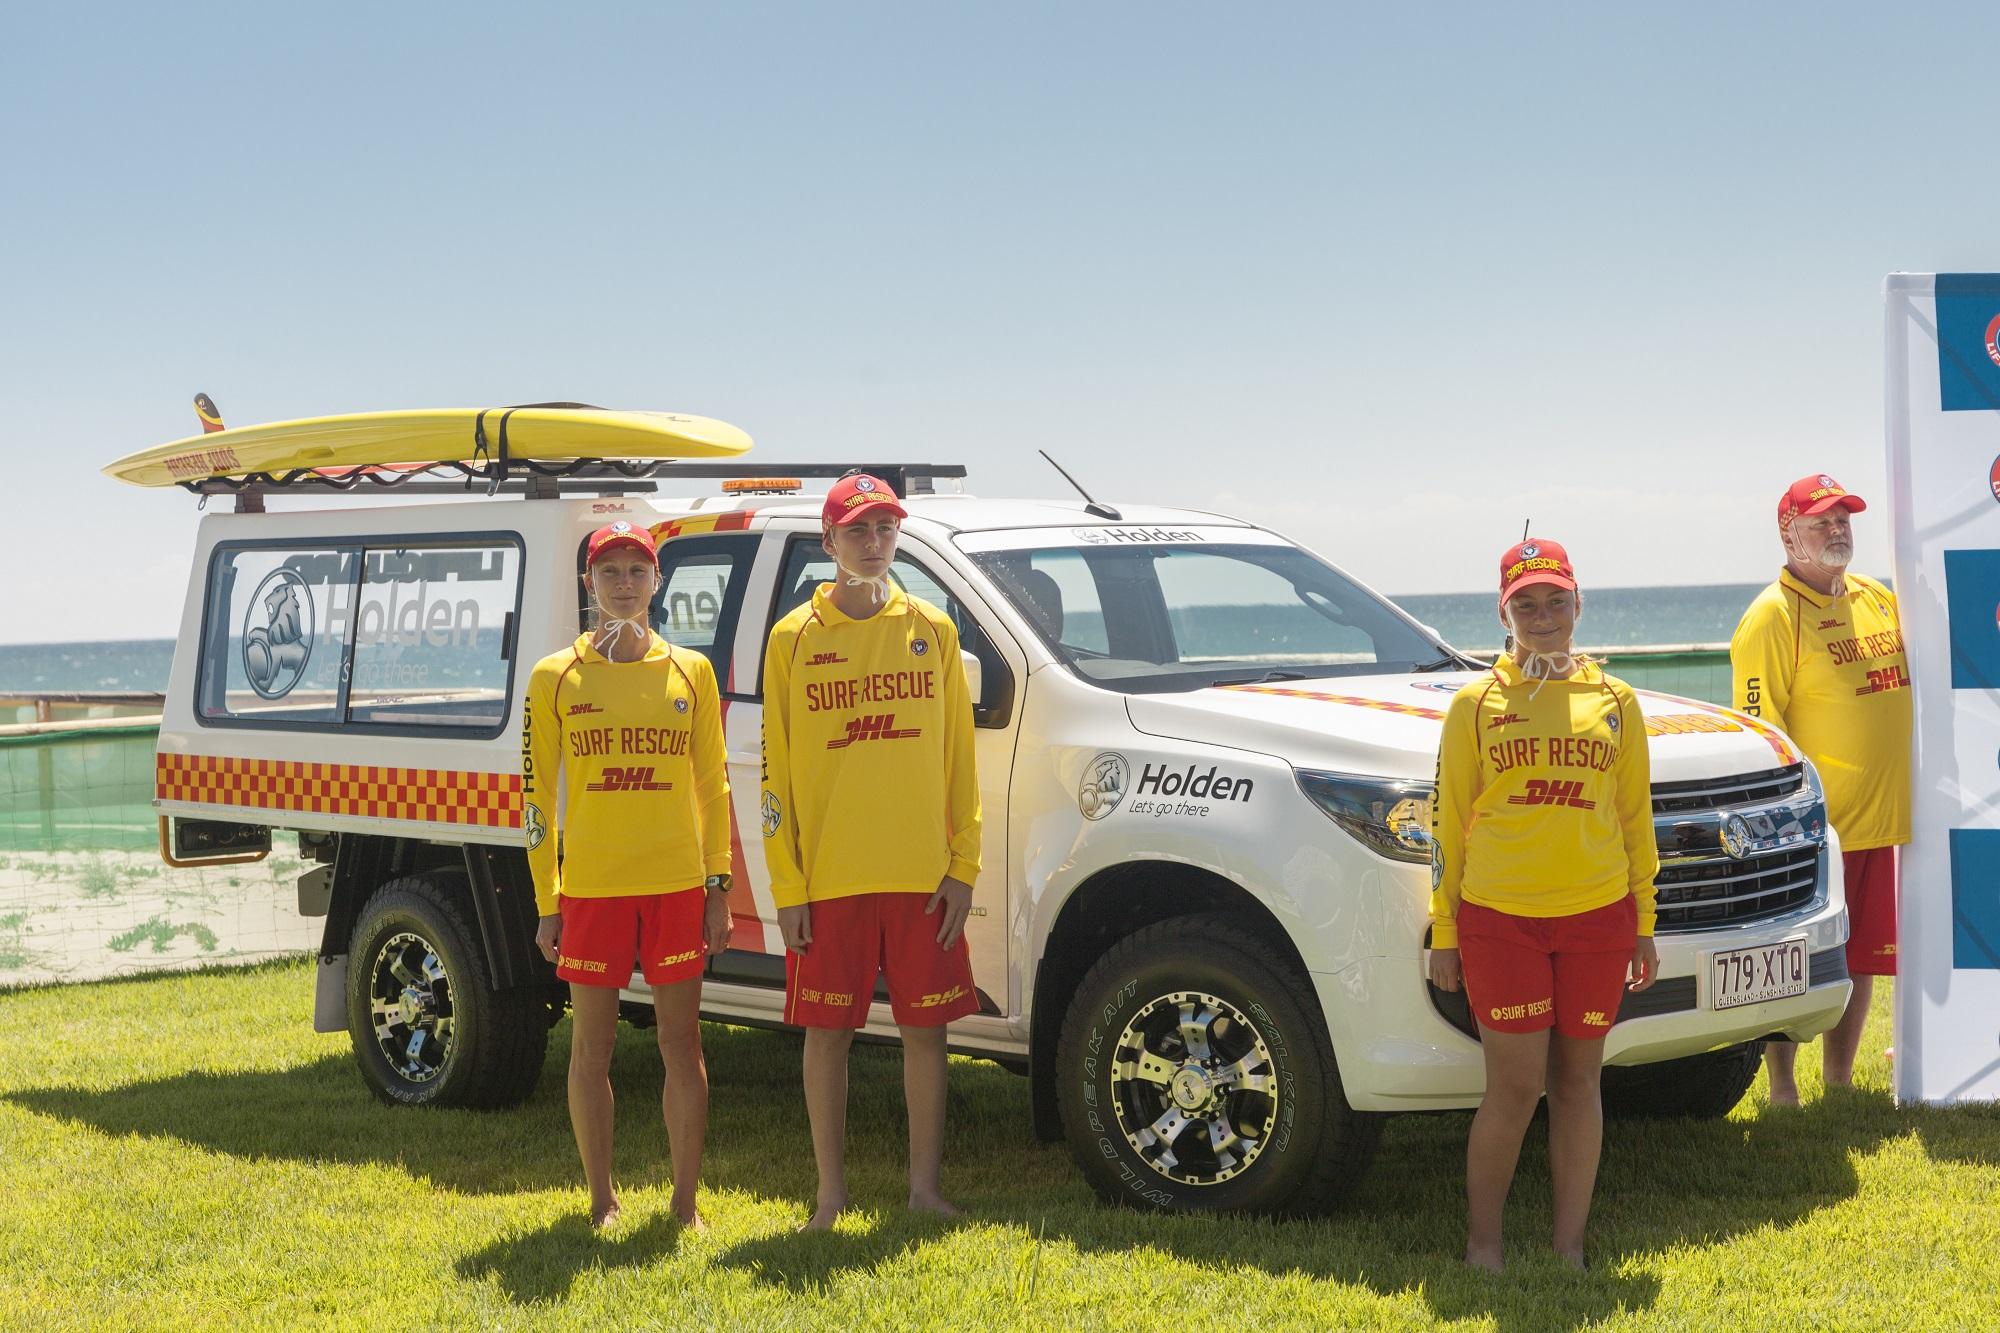 Holden-Surf Life Saving Australia partnership [1]